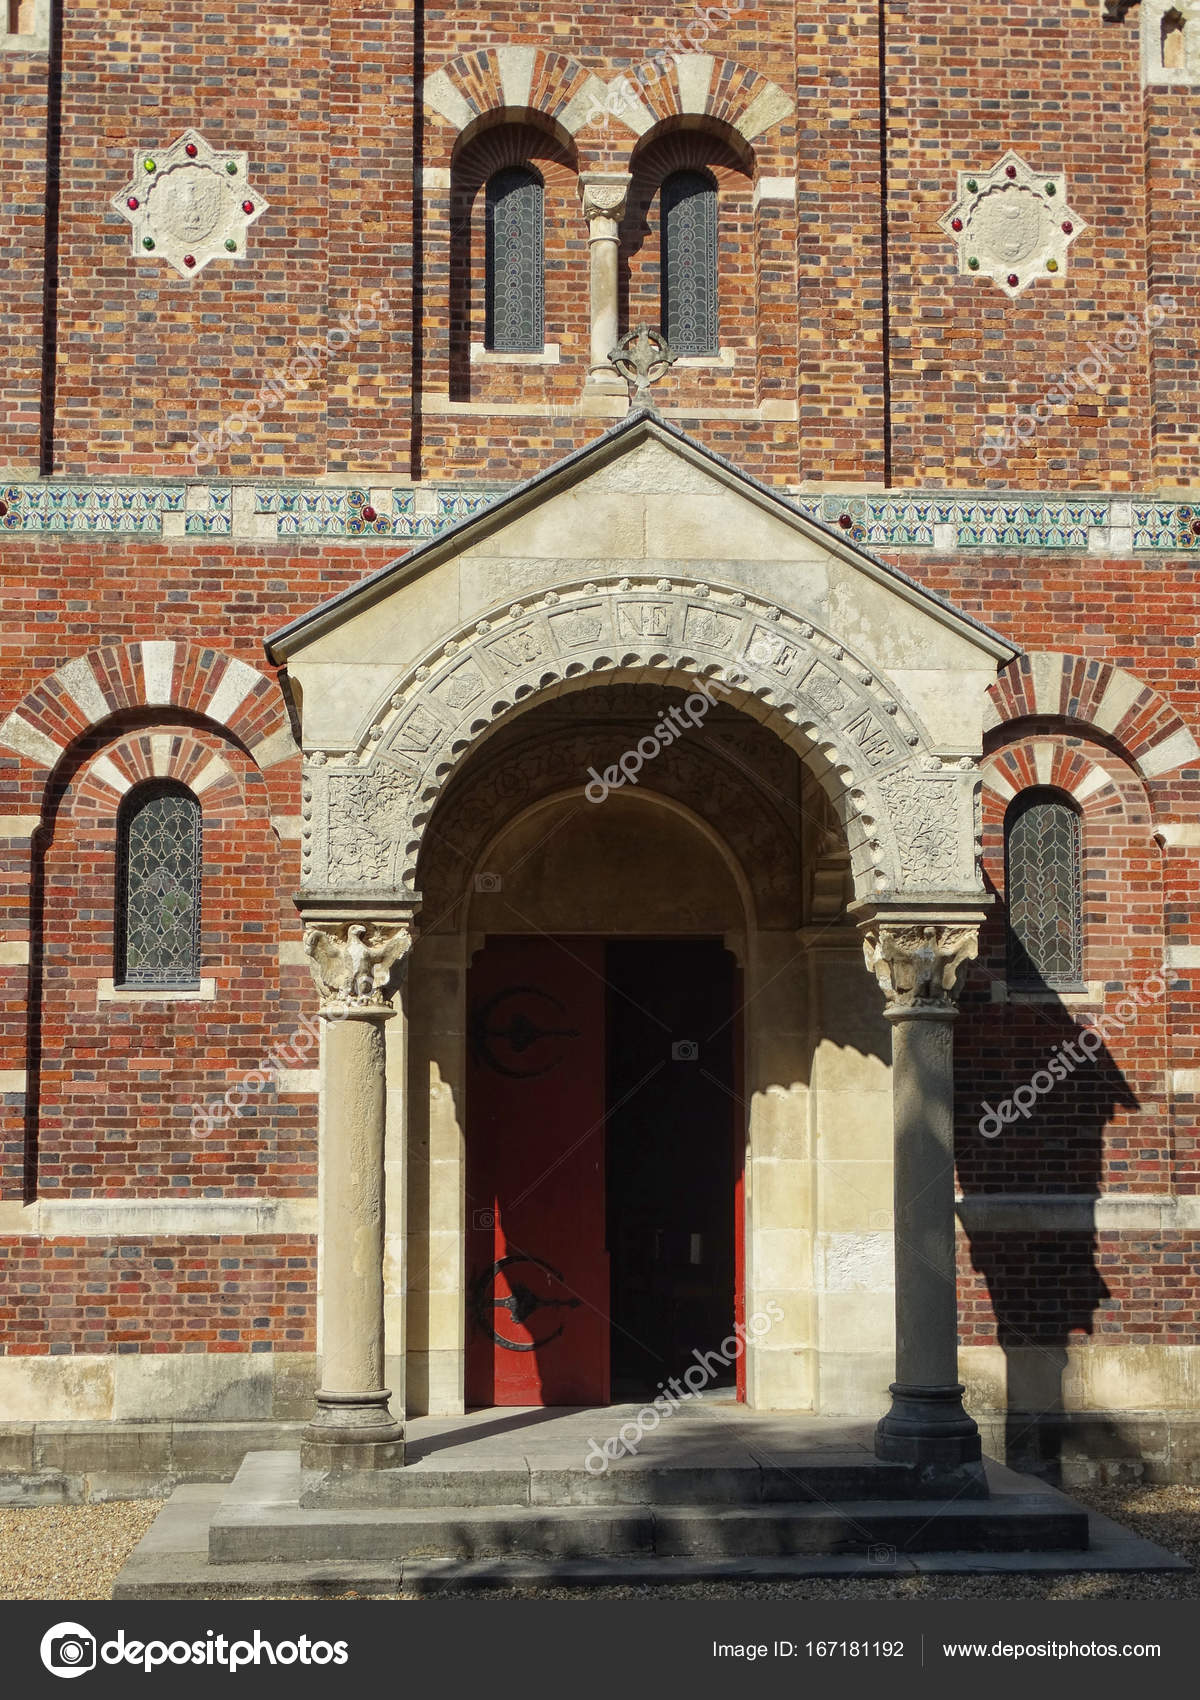 Imperial Chapel Moorish Door in Biarritz u2014 Stock Photo & Imperial Chapel Moorish Door in Biarritz u2014 Stock Photo © Fani014 ...